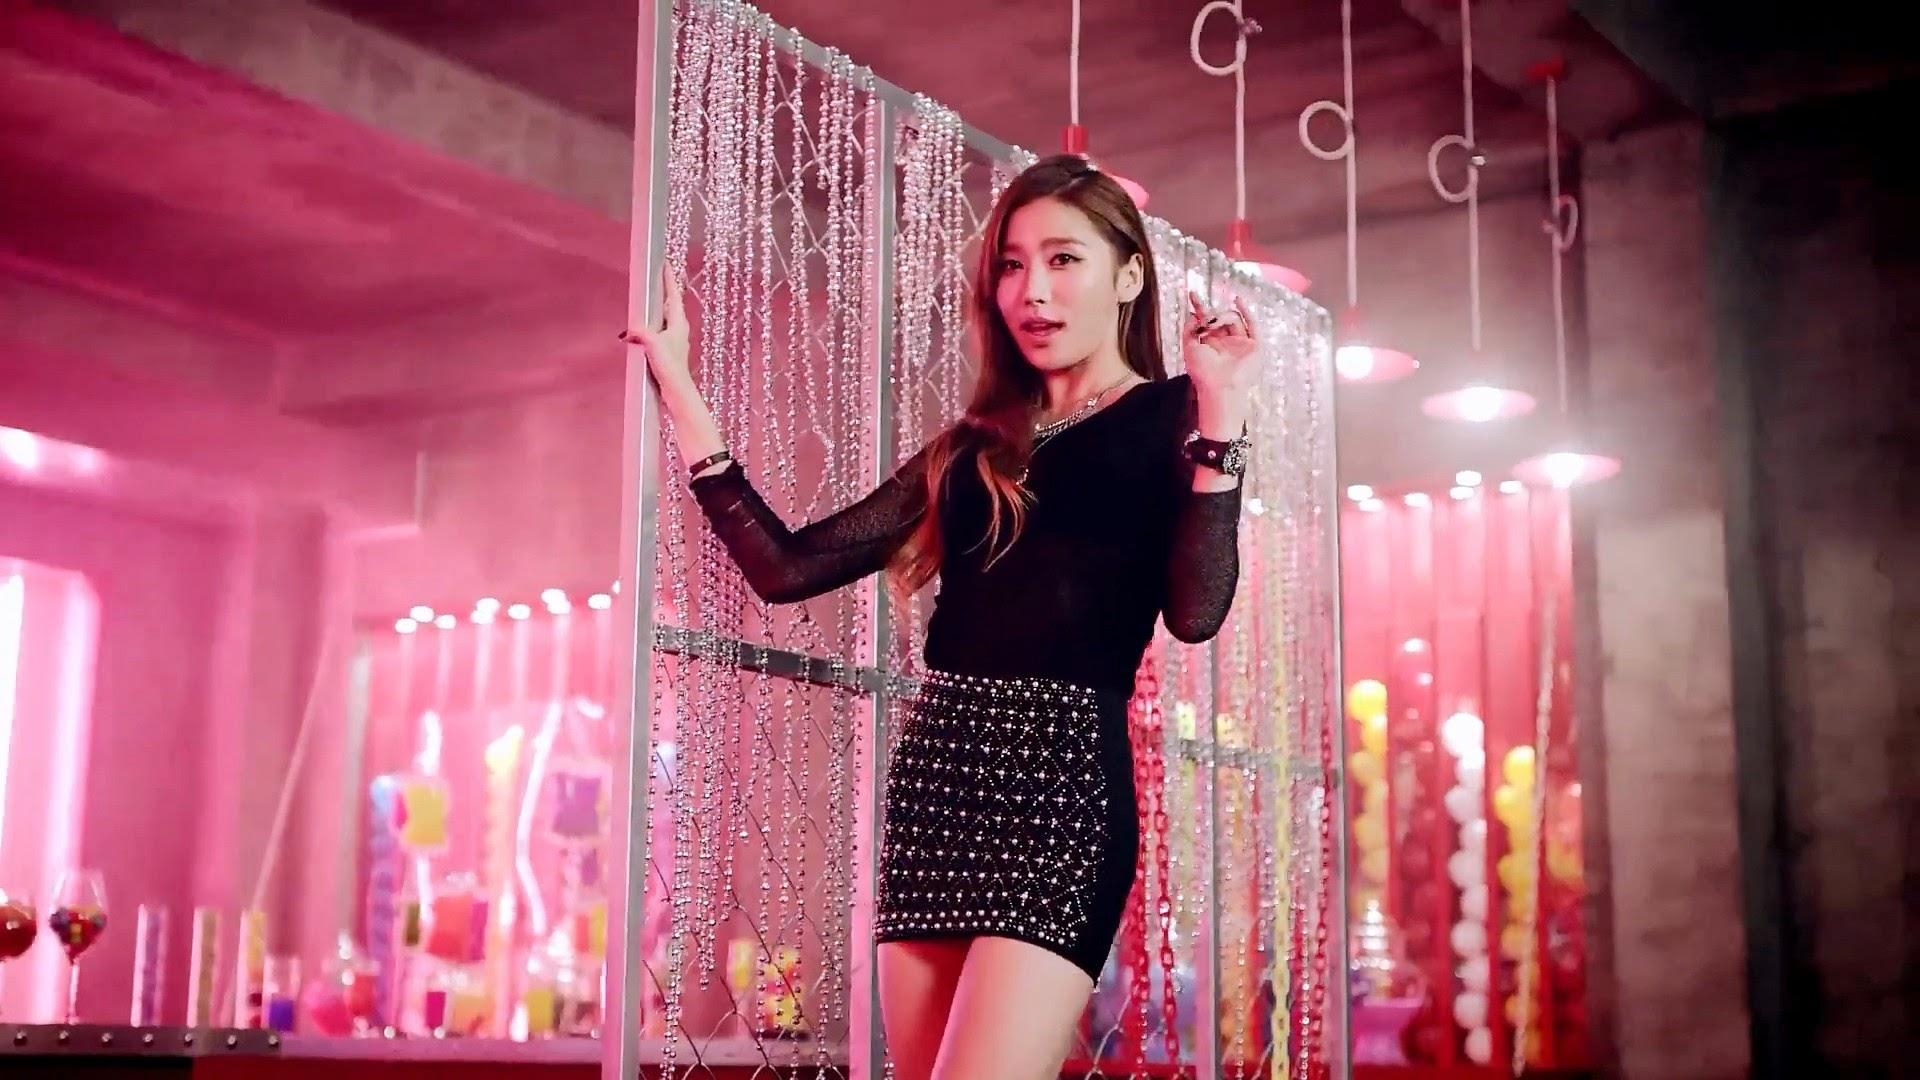 HelloVenus Yooyoung StickySticky